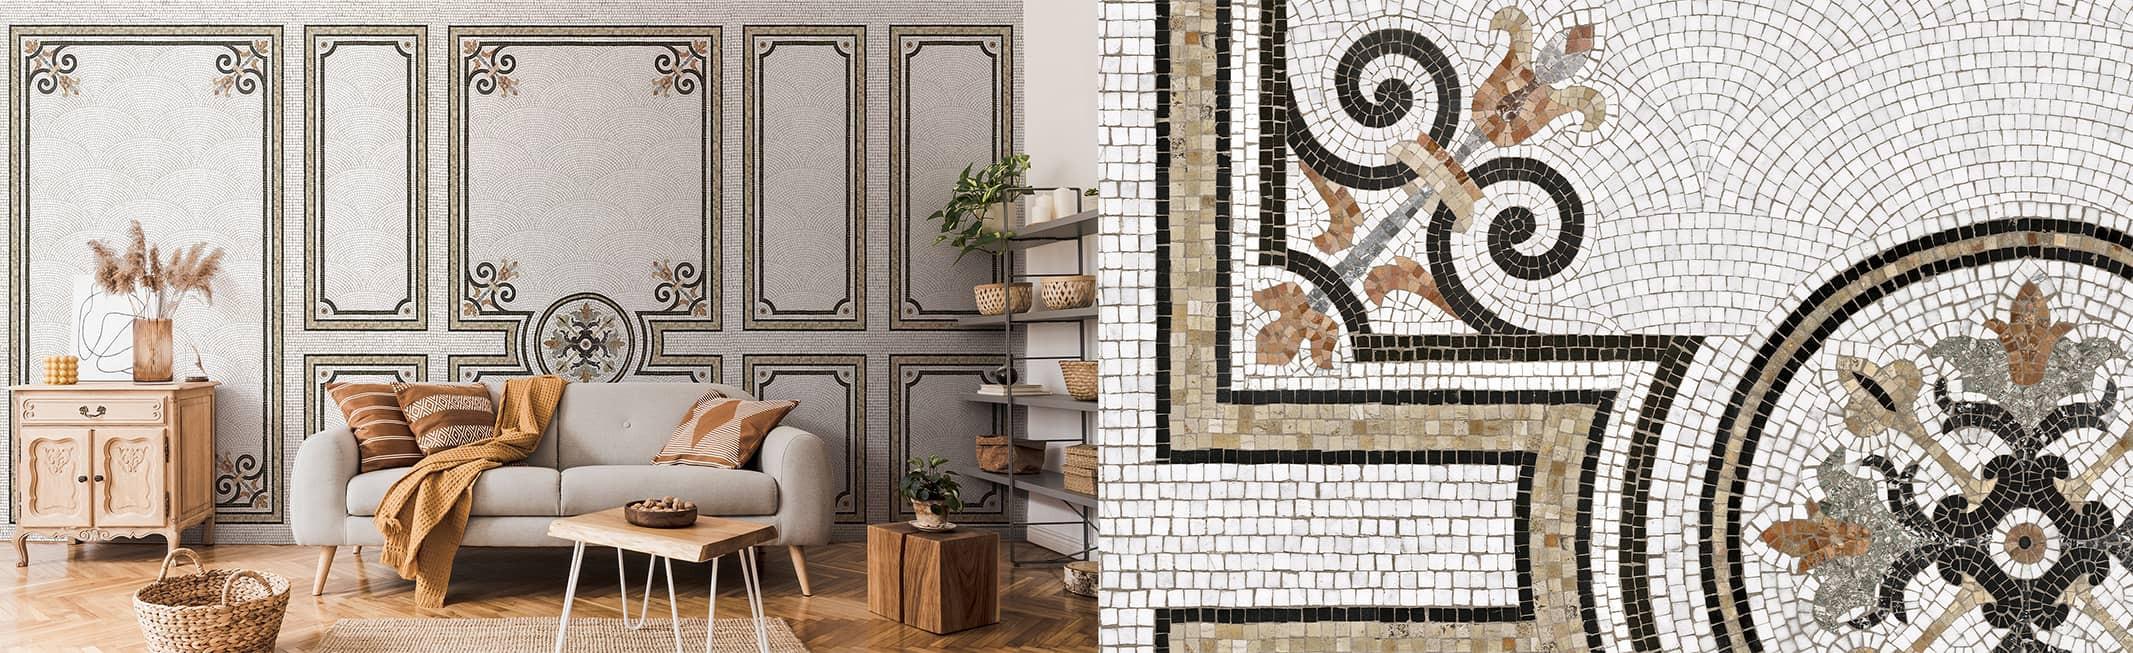 mosaic wide mural